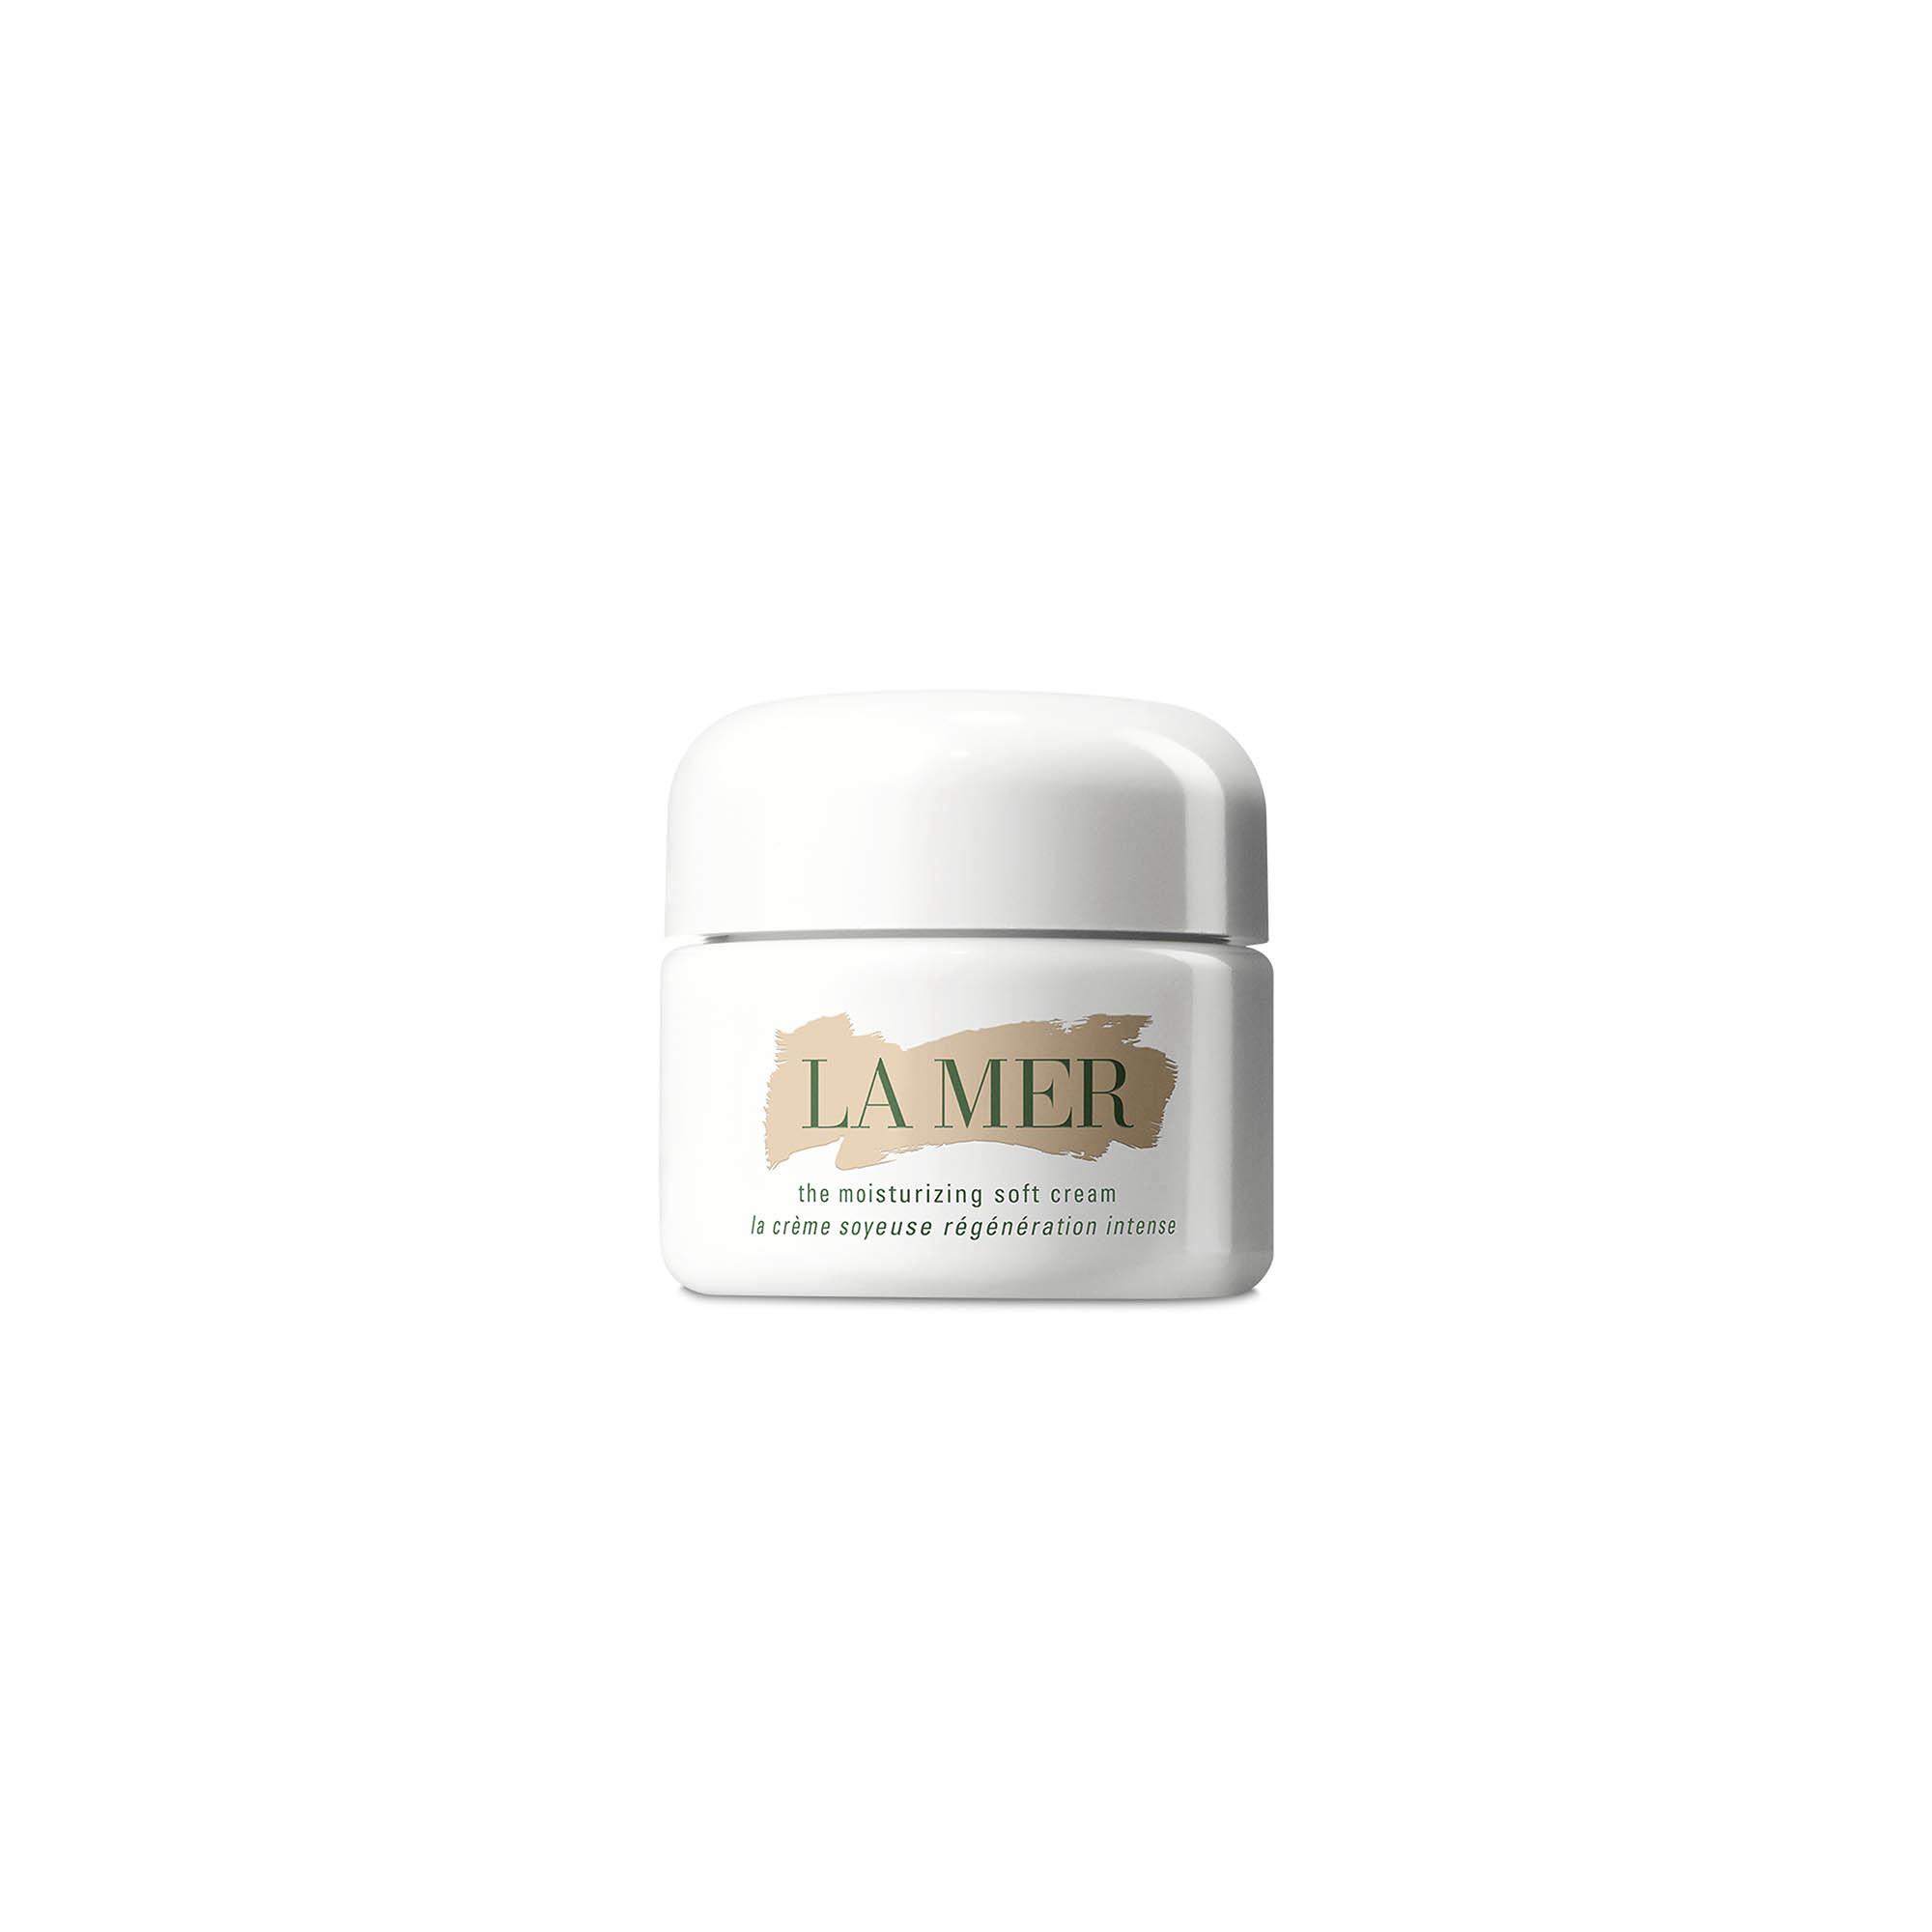 La Mer The Moisturizing Soft Cream, 30 ml